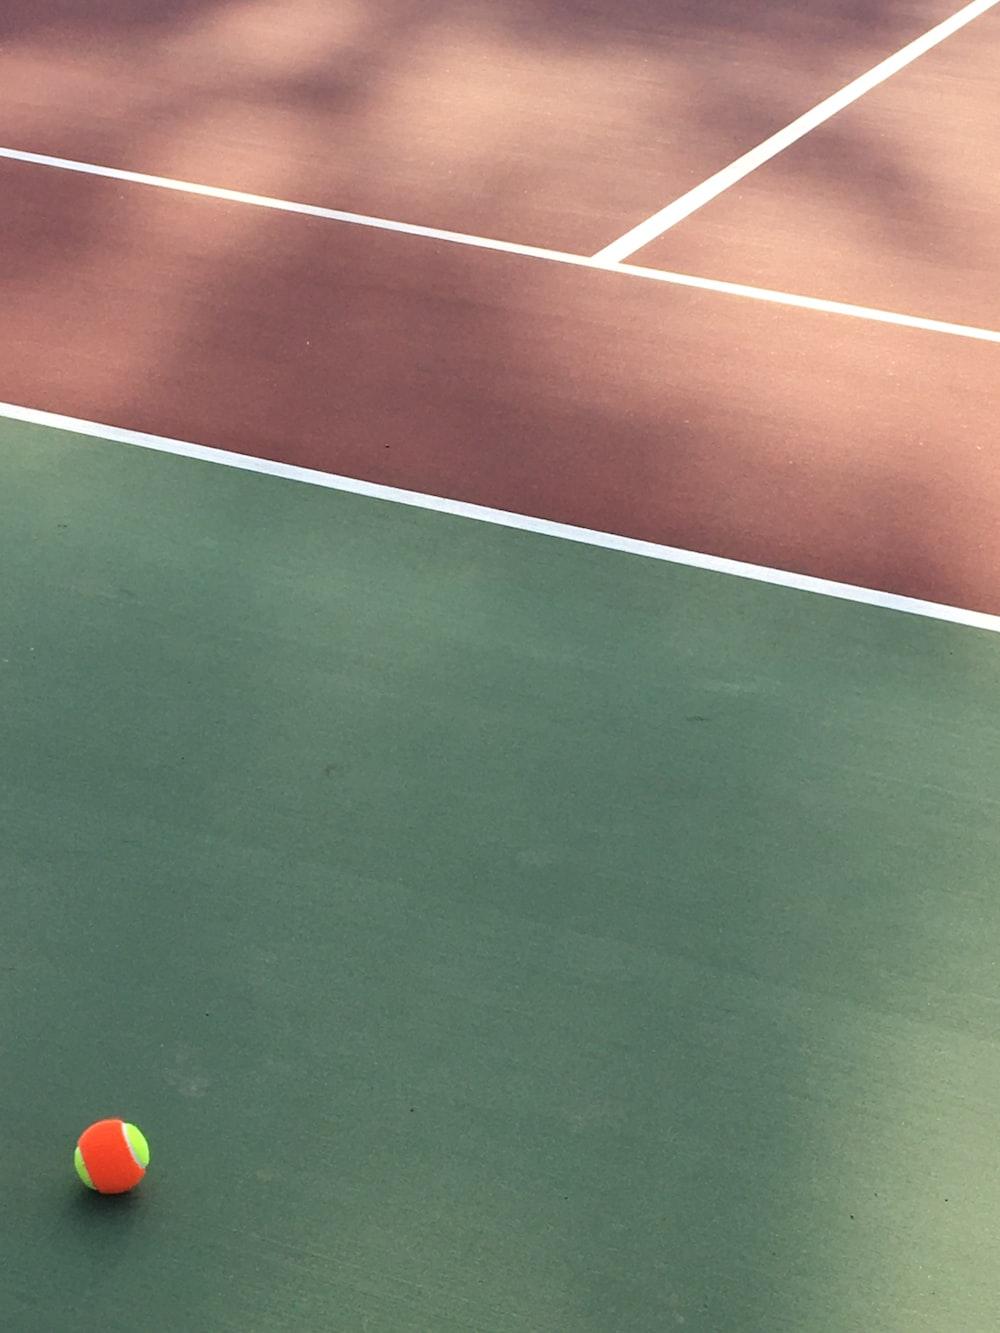 orange and green tennis ball